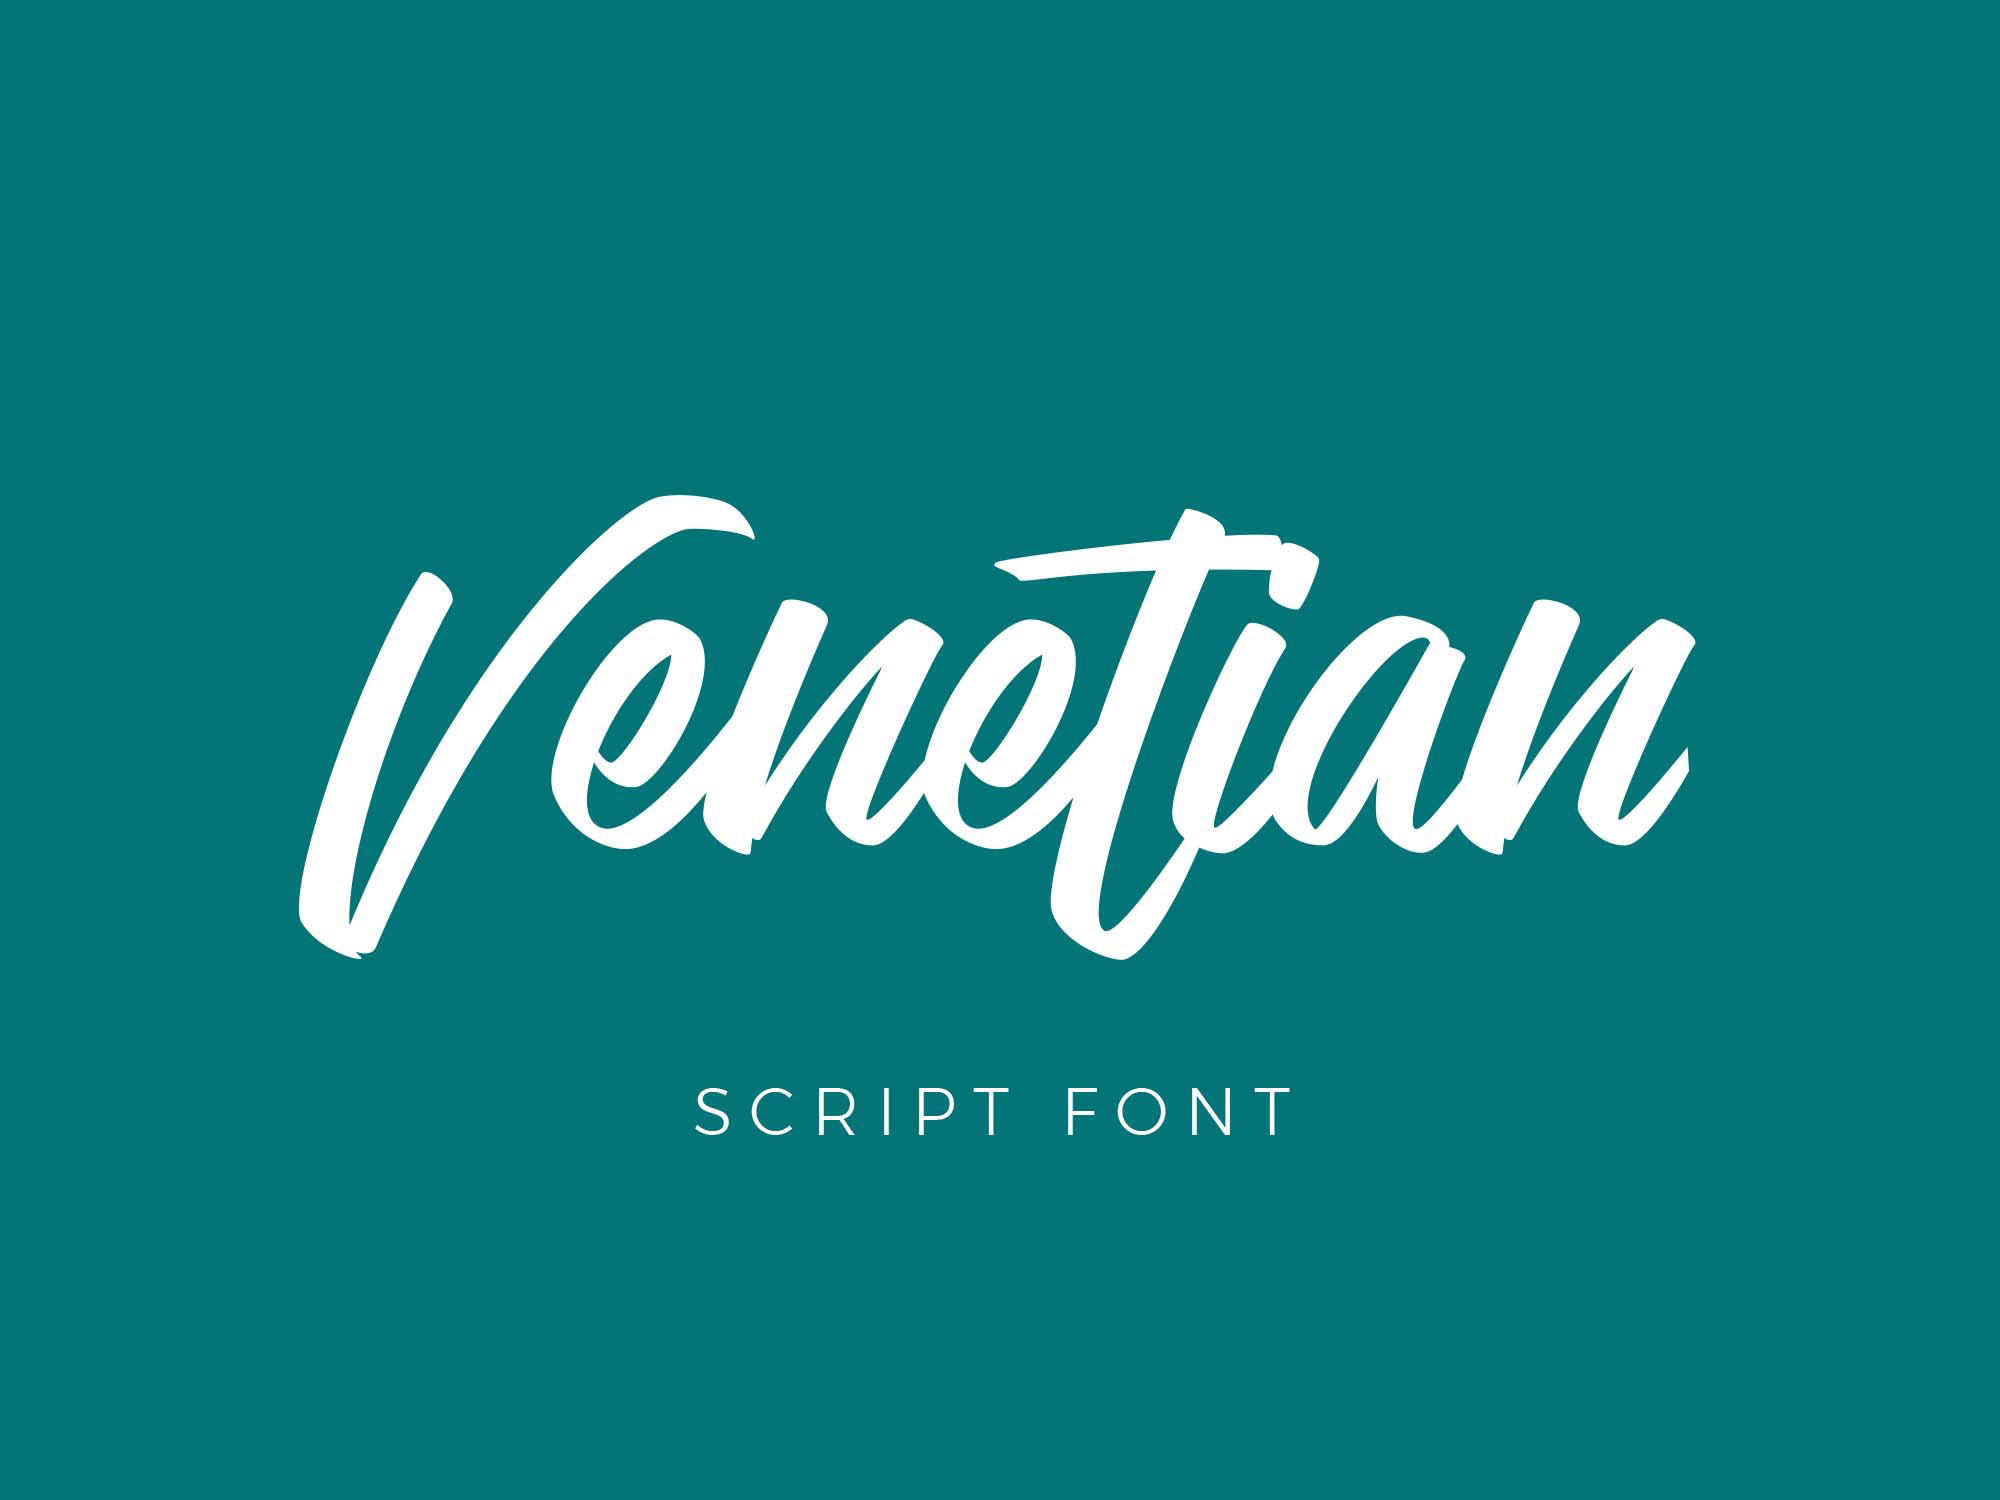 Venetian Font